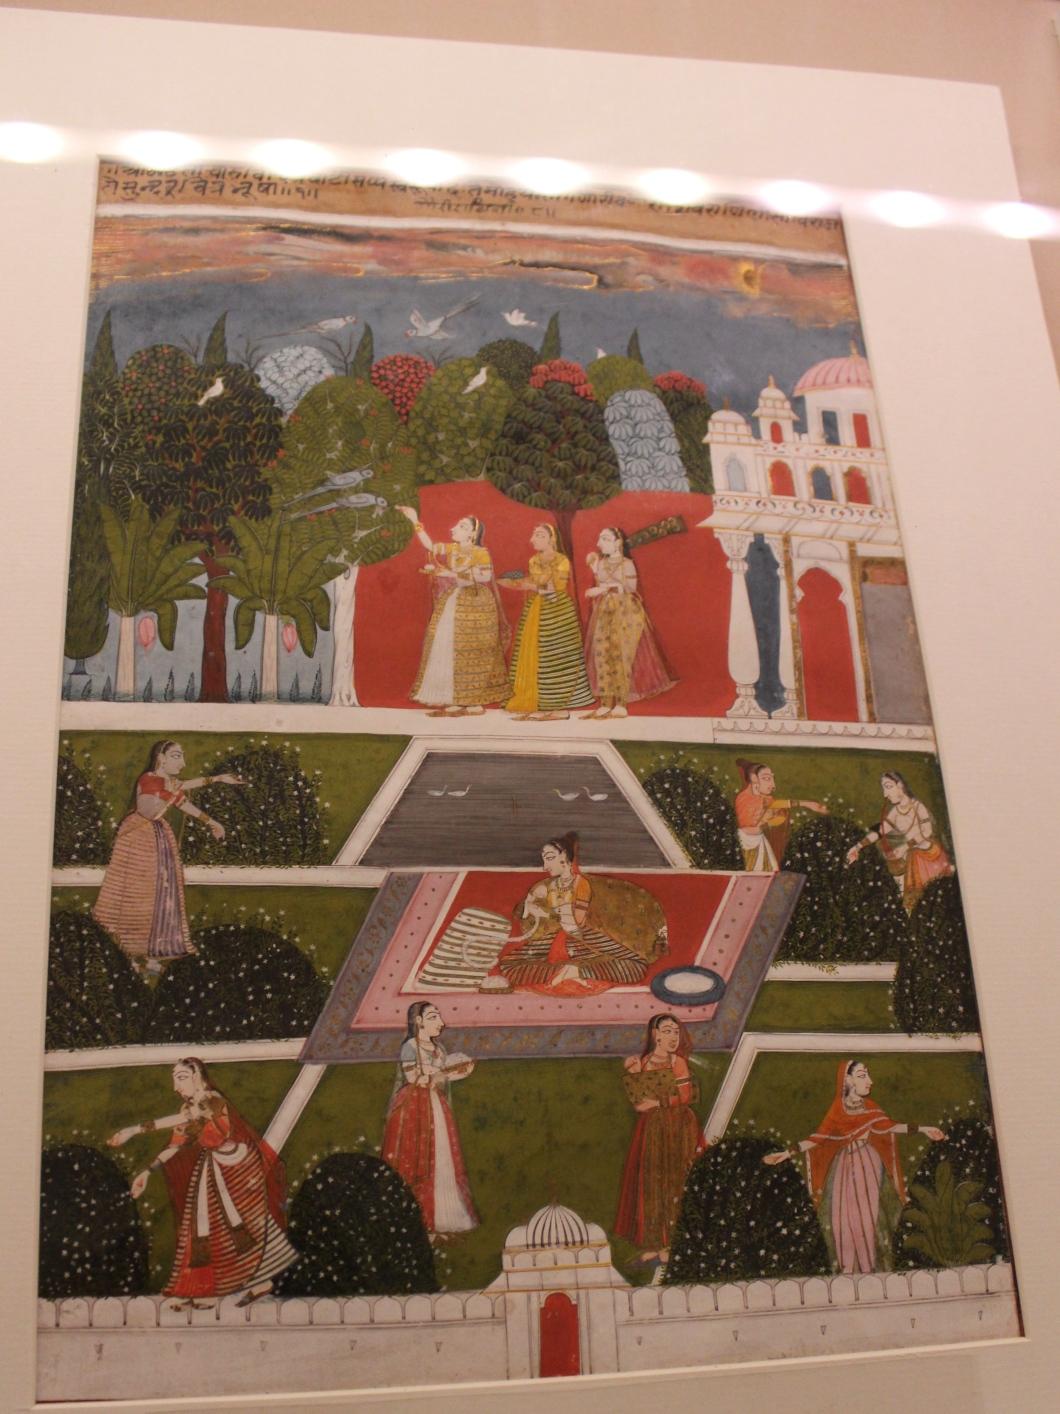 Ragini Gauri: Malwa, Central India, C 1700 CE (Indian Miniature Painting - Photograph in mirandavoice.com)